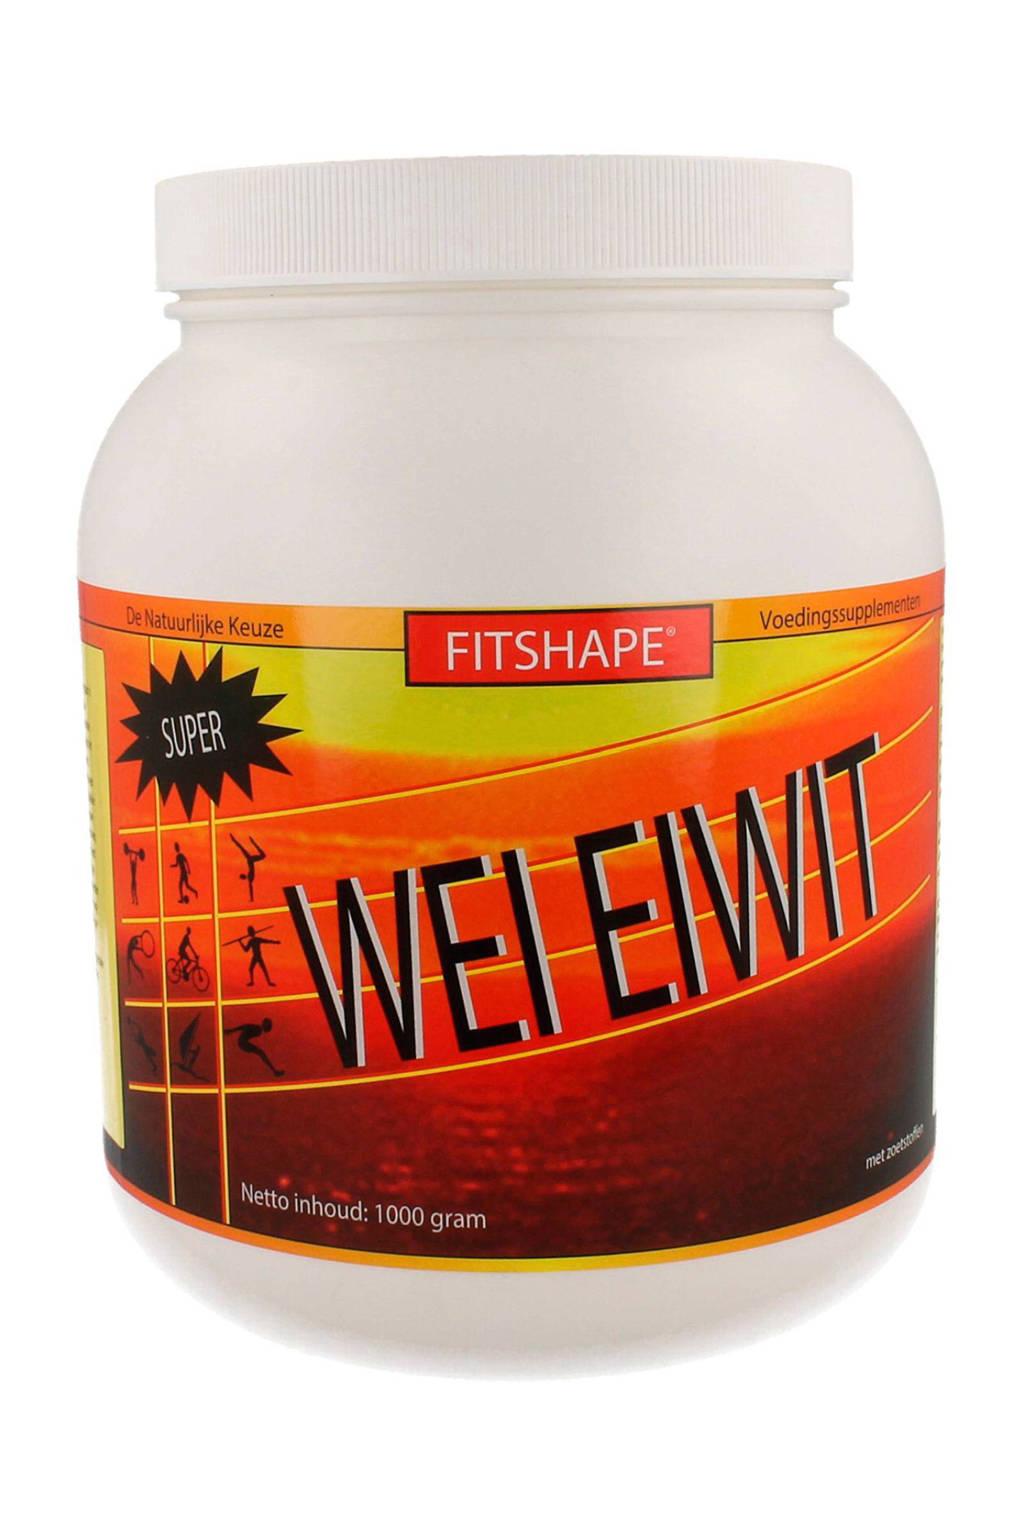 Fitshape Wei Eiwit eiwitshake - Vanille - 1000 gram - sportvoeding